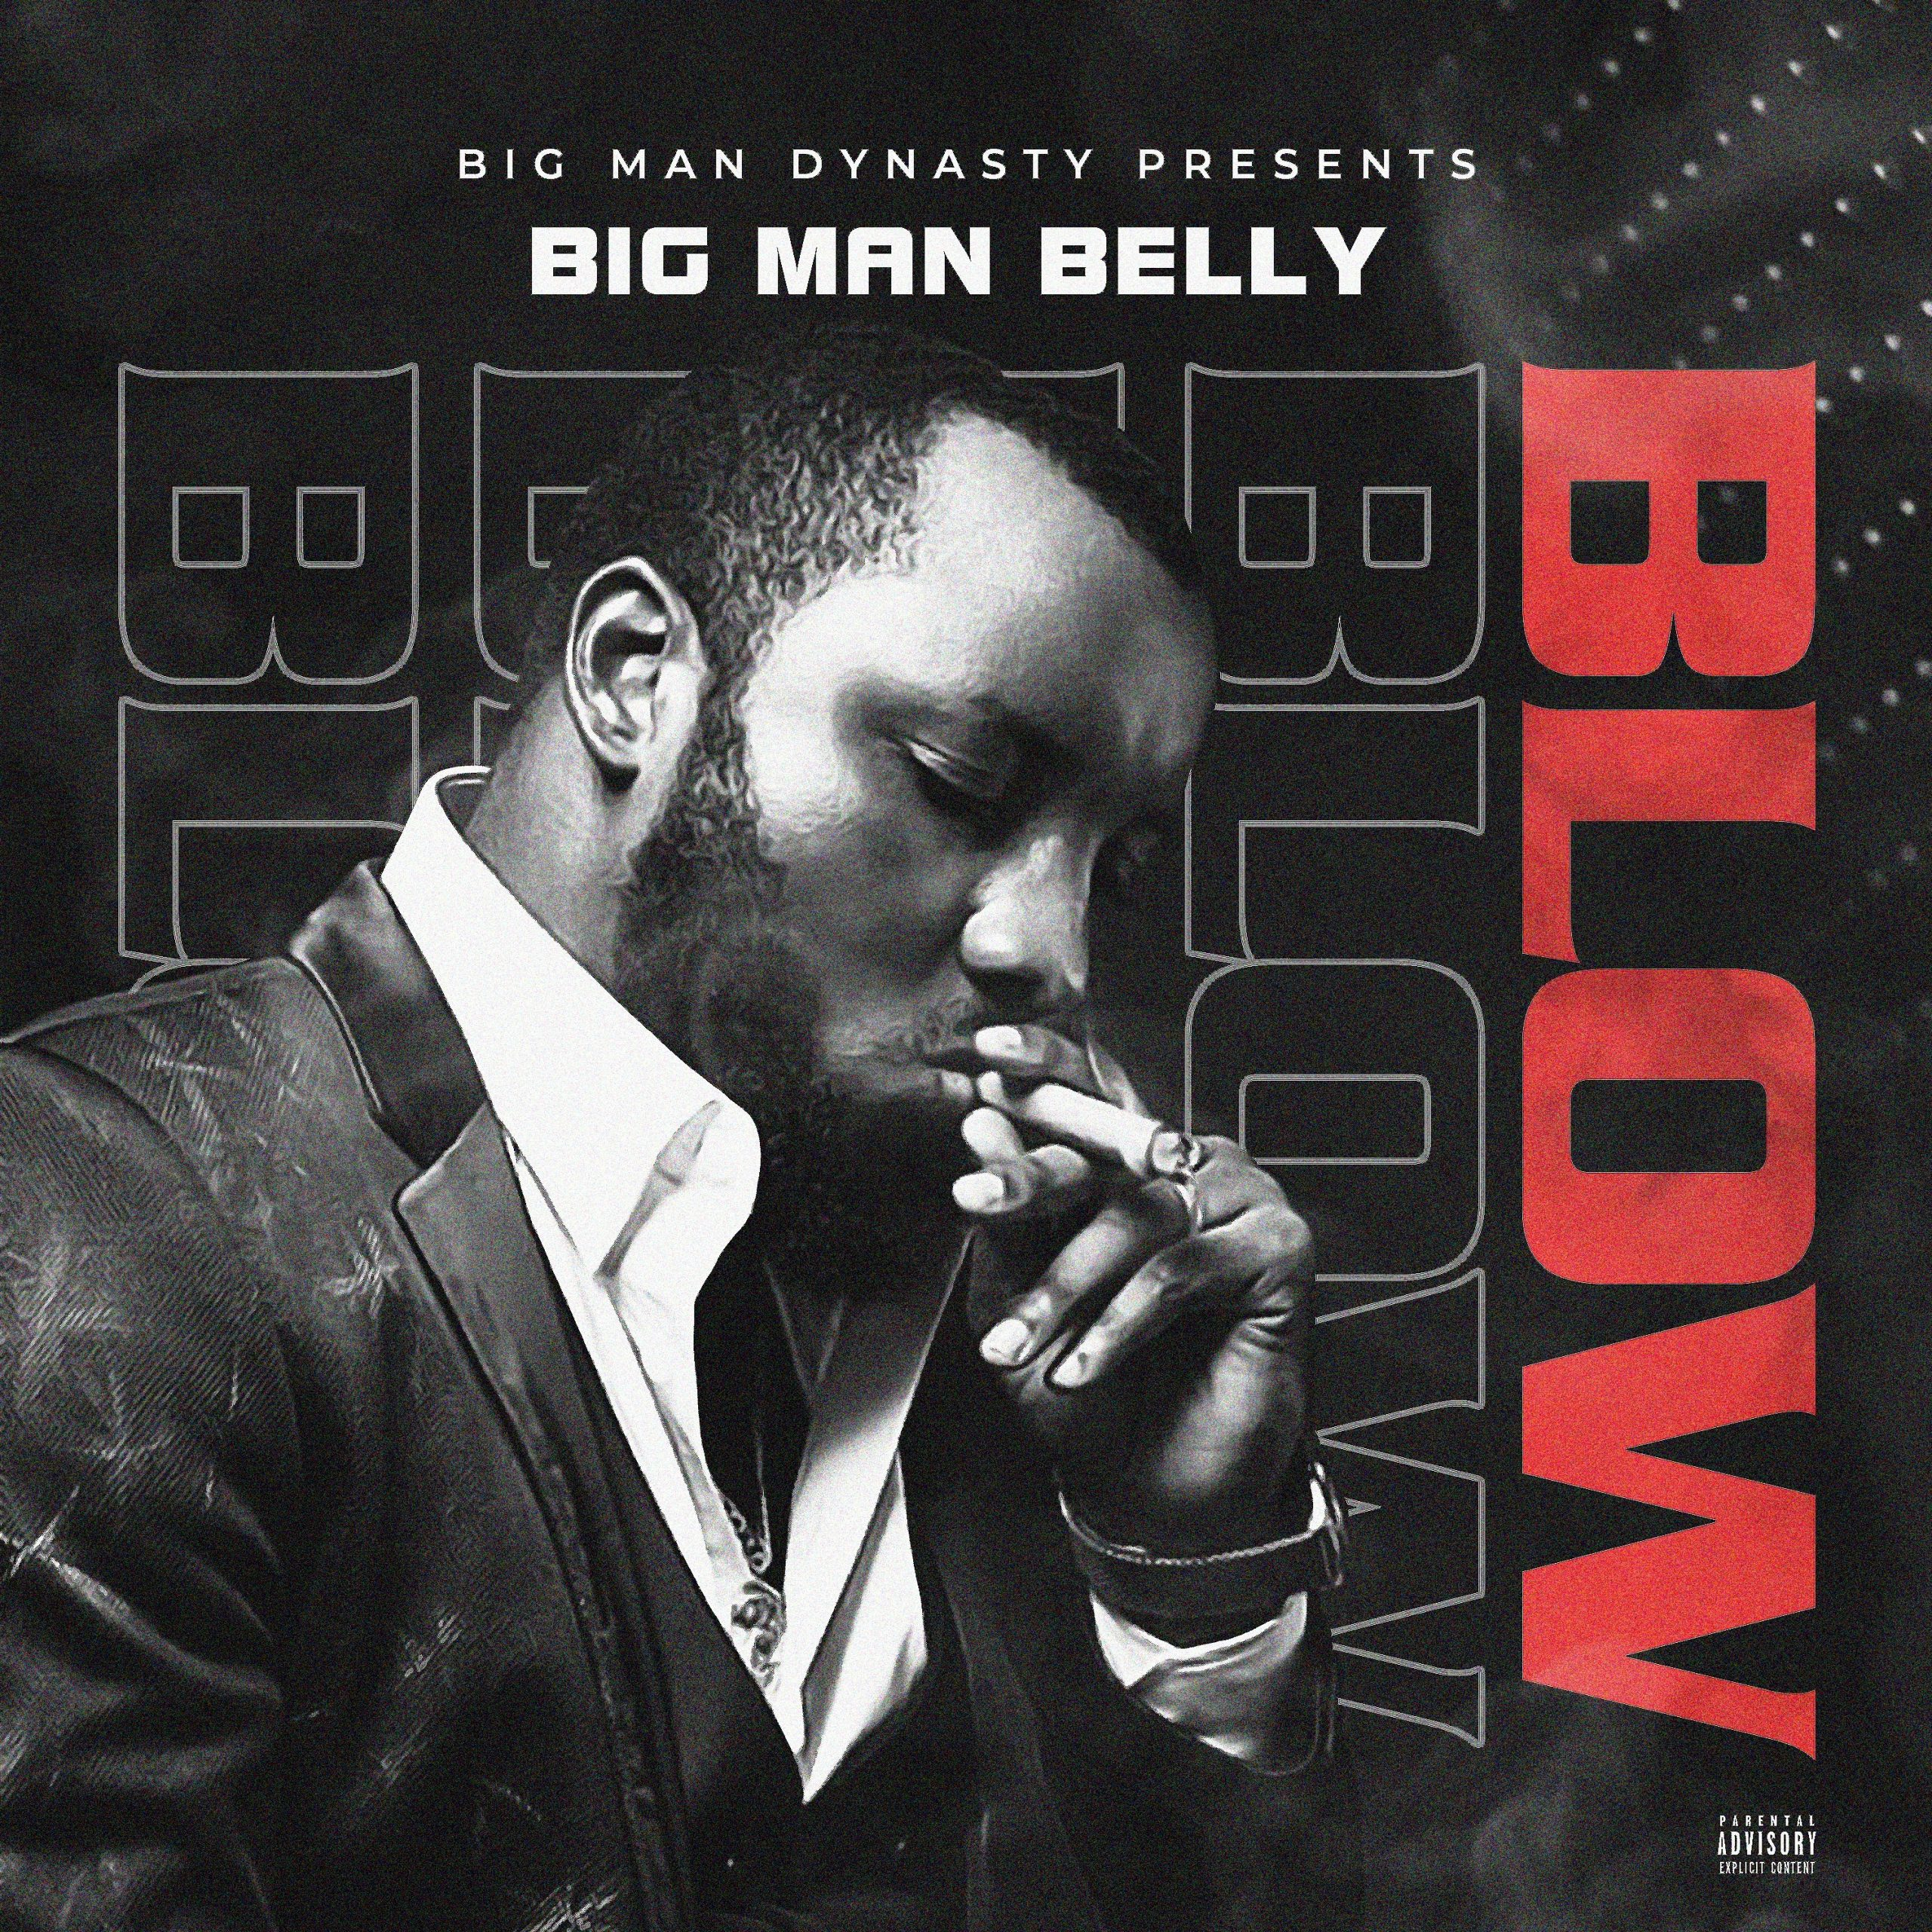 Big man belly - Blow